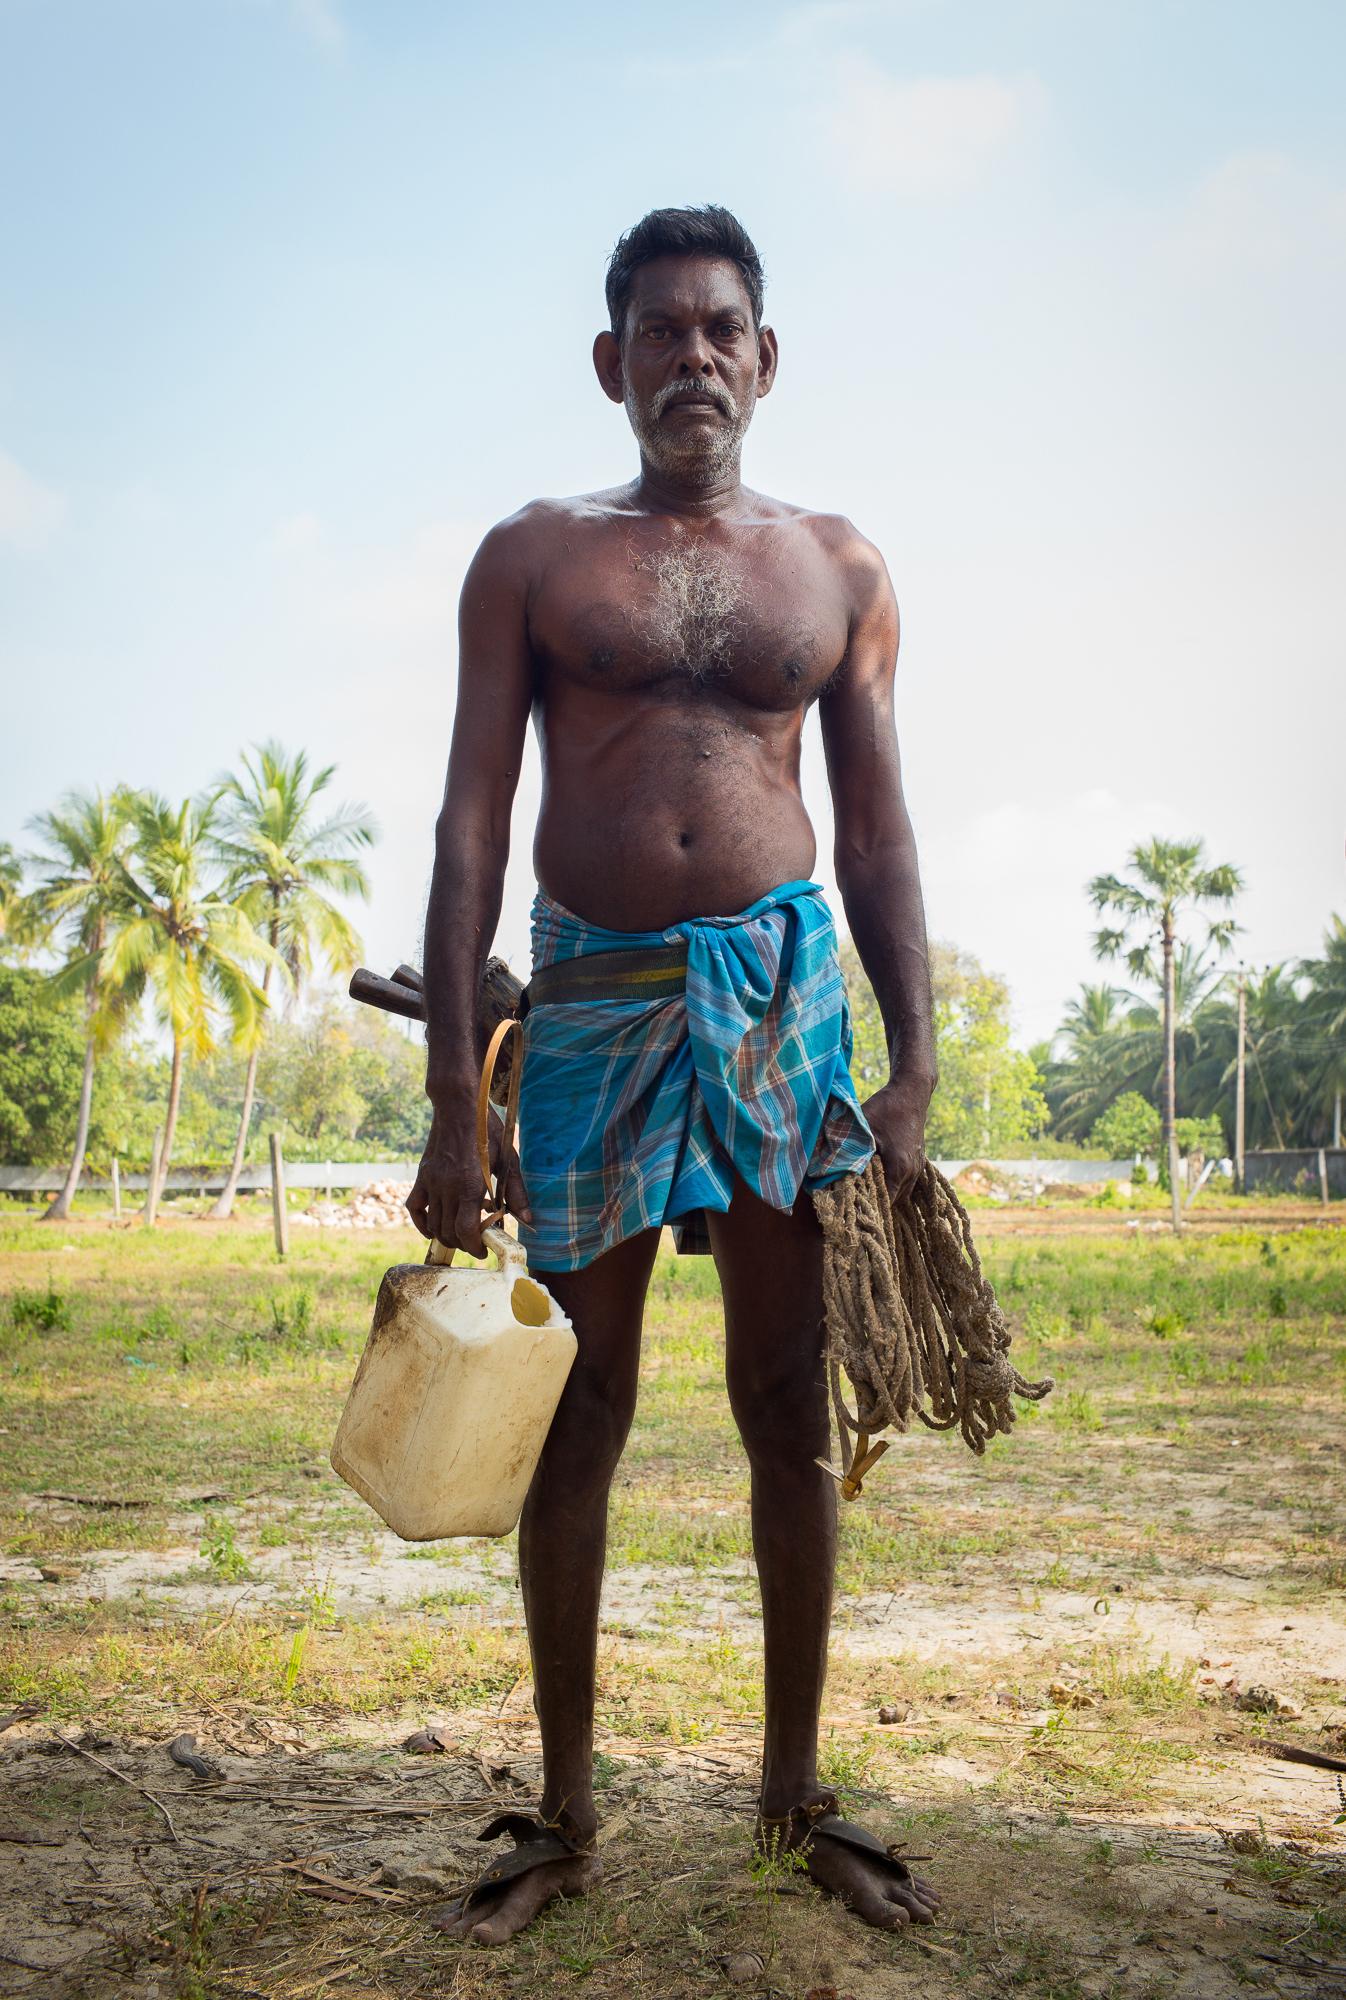 A toddy tapper outside the village of Navaly near Jaffna, northern Sri Lanka.